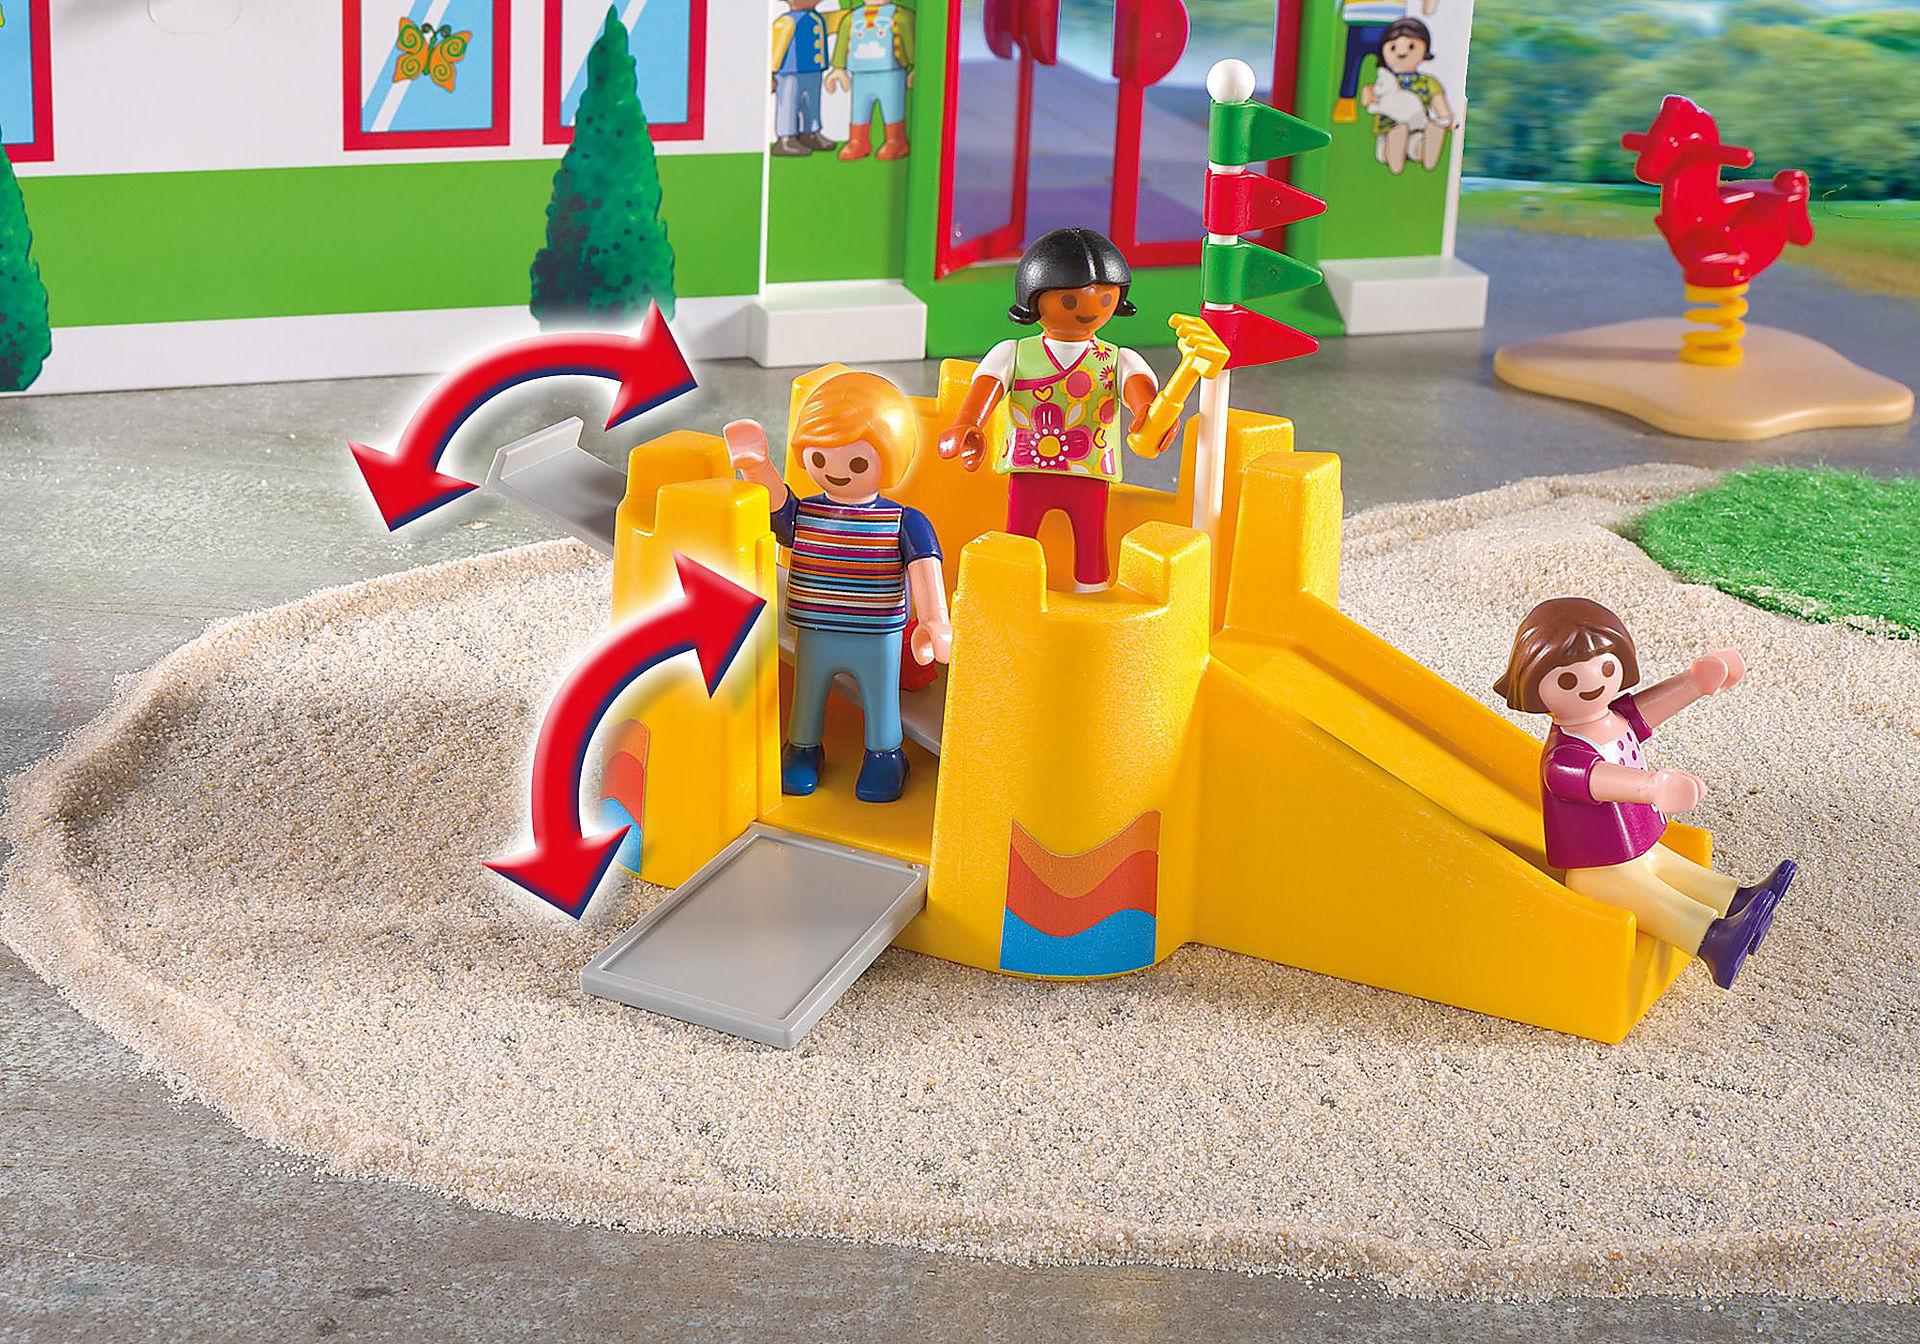 http://media.playmobil.com/i/playmobil/5606_product_extra2/Kindergarten